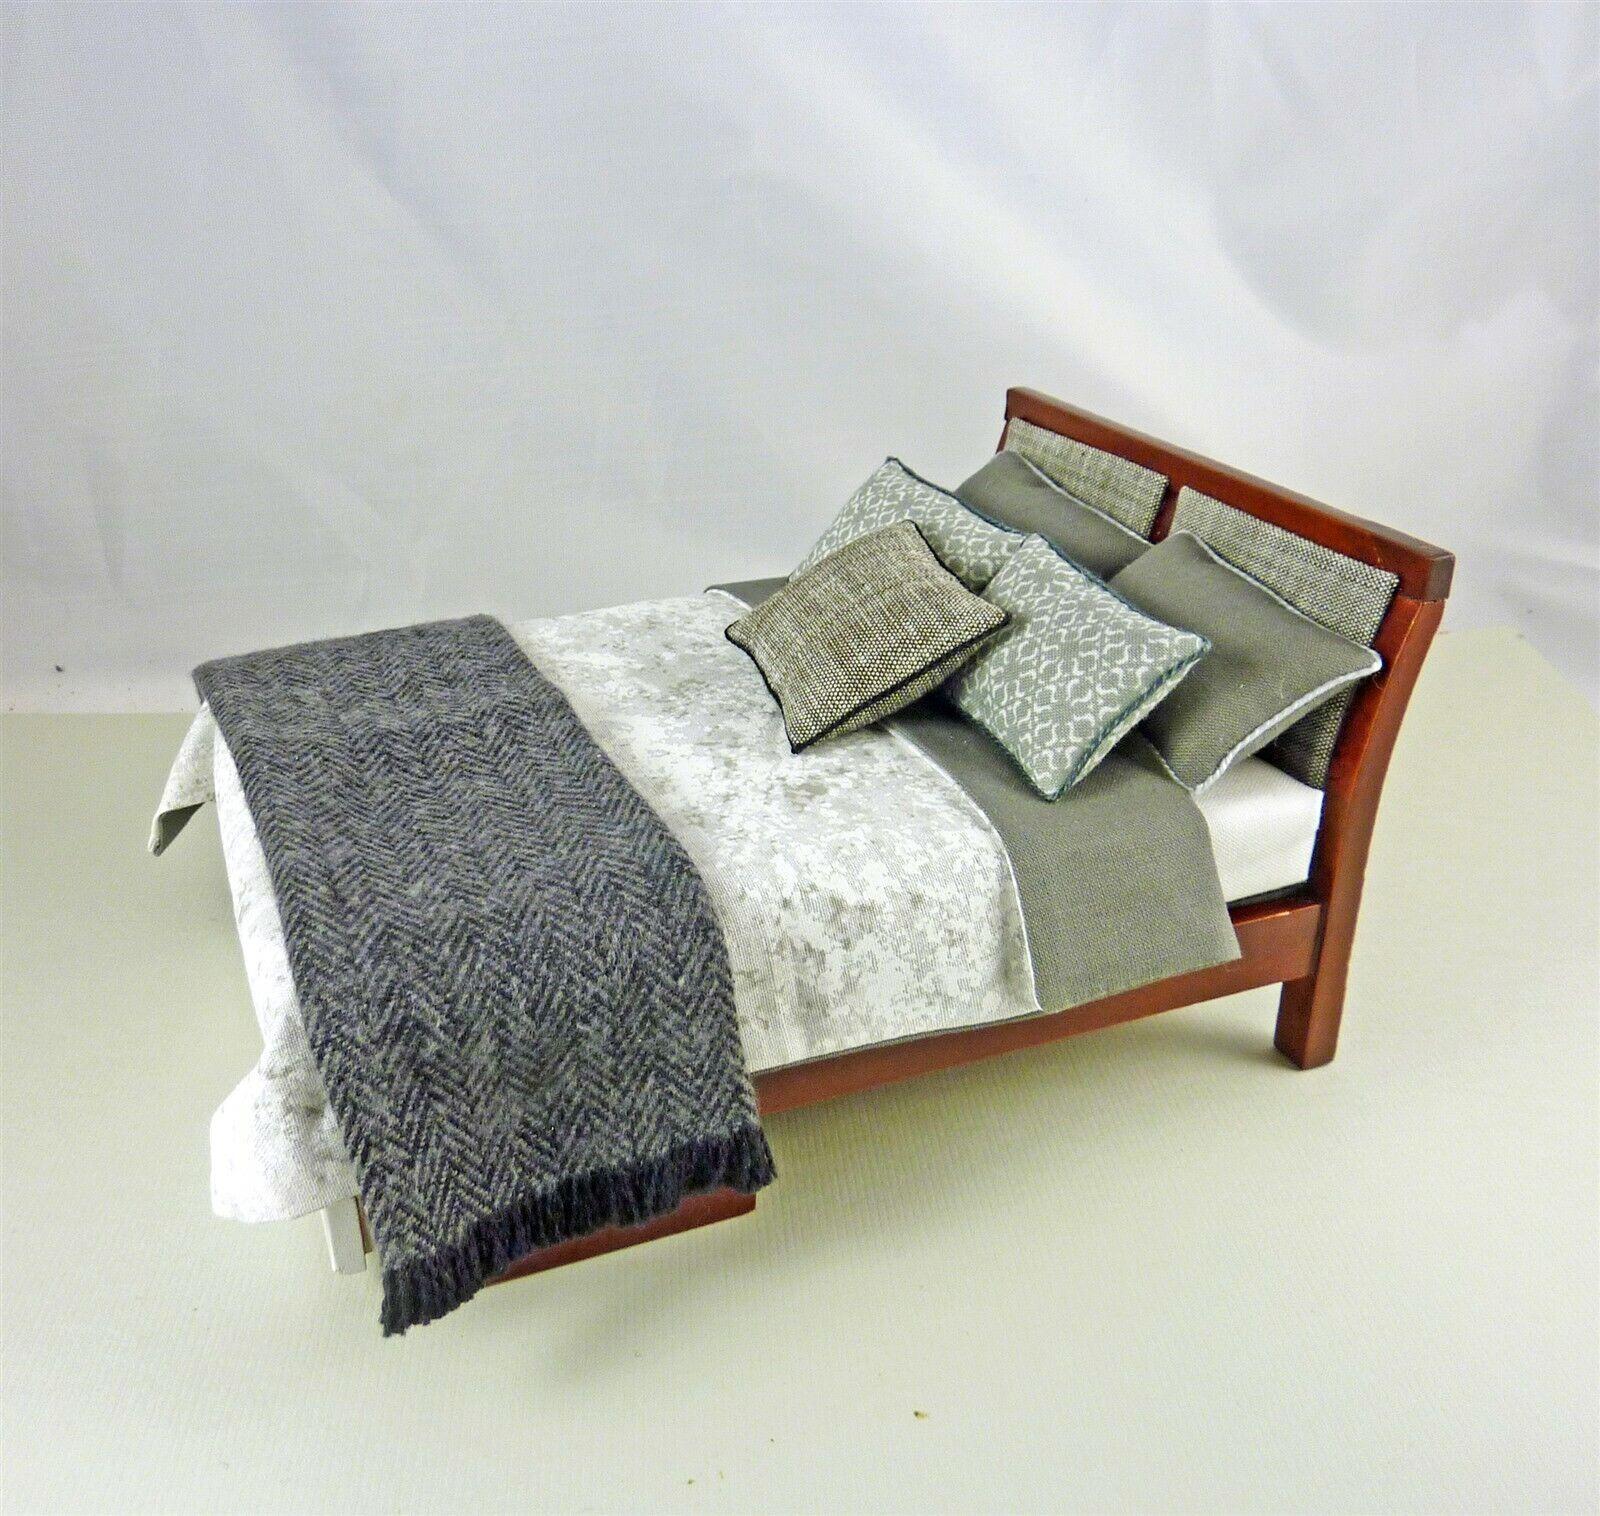 Dollhouse Miniature Artisan Dressed Modern Platform Bed with Throw